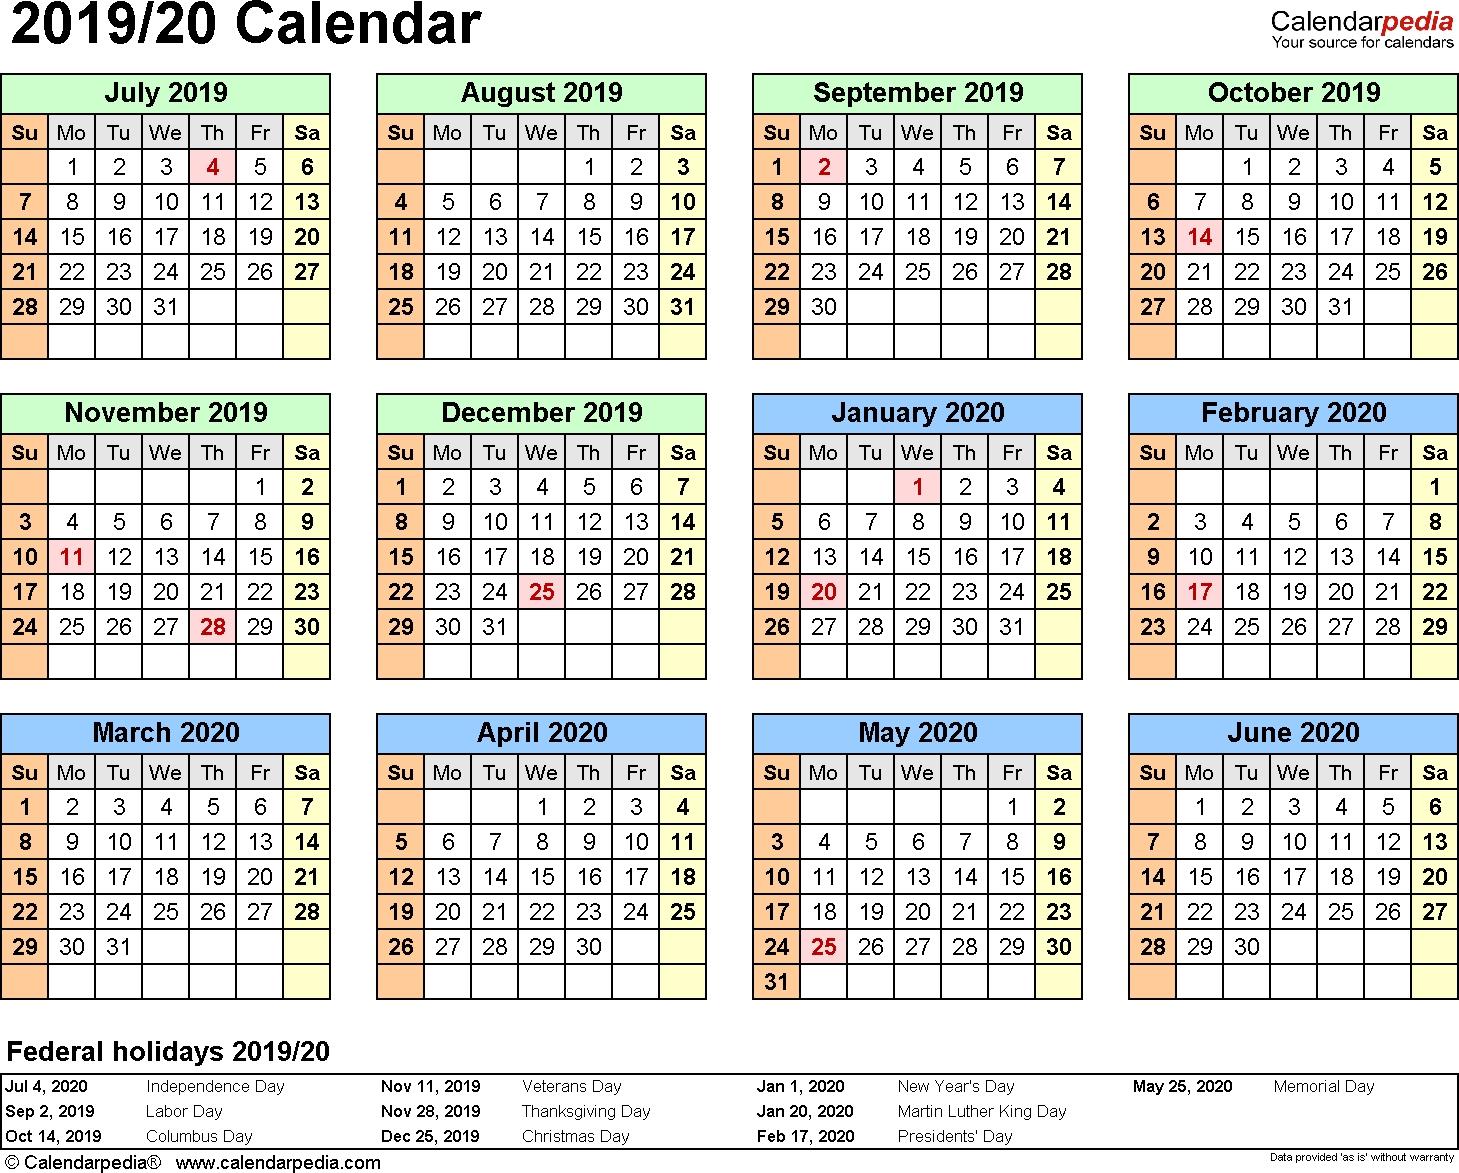 Split Year Calendar 2019/20 (July To June) - Pdf Templates regarding Print 2019/2020 Financial Year Calendar On One Page